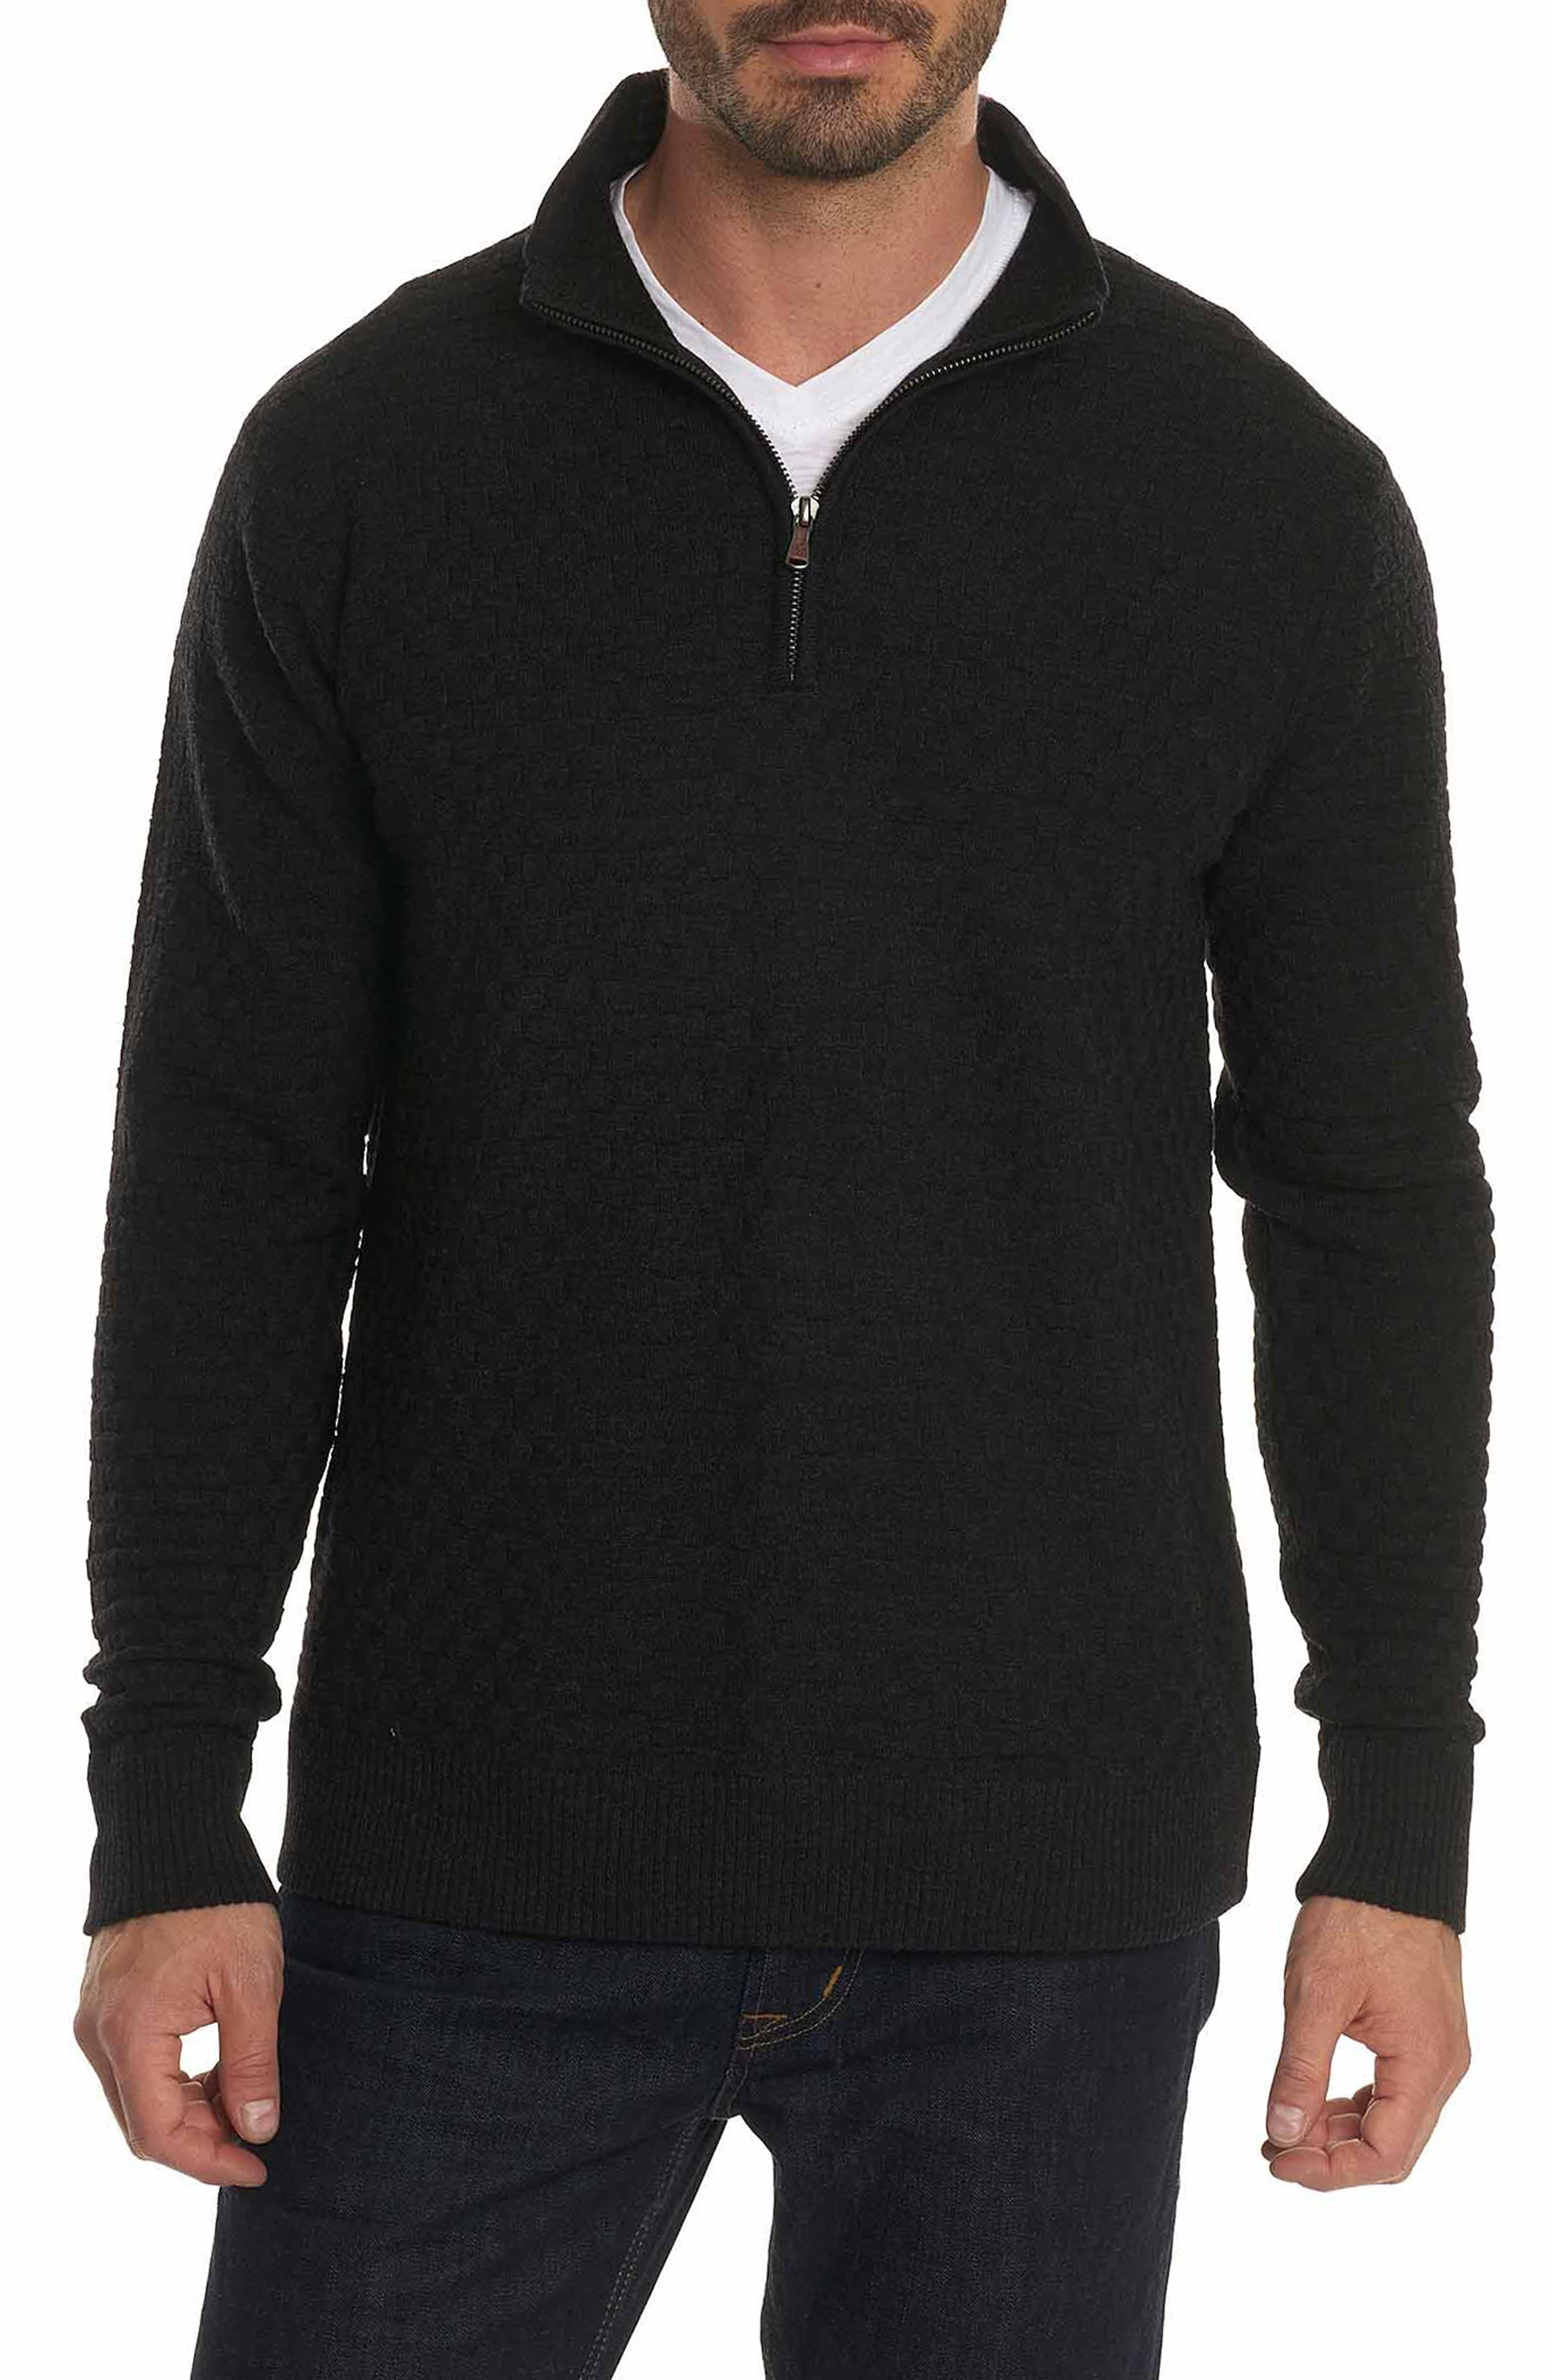 American Beech Wool Sweater,                         Main,                         color, 001